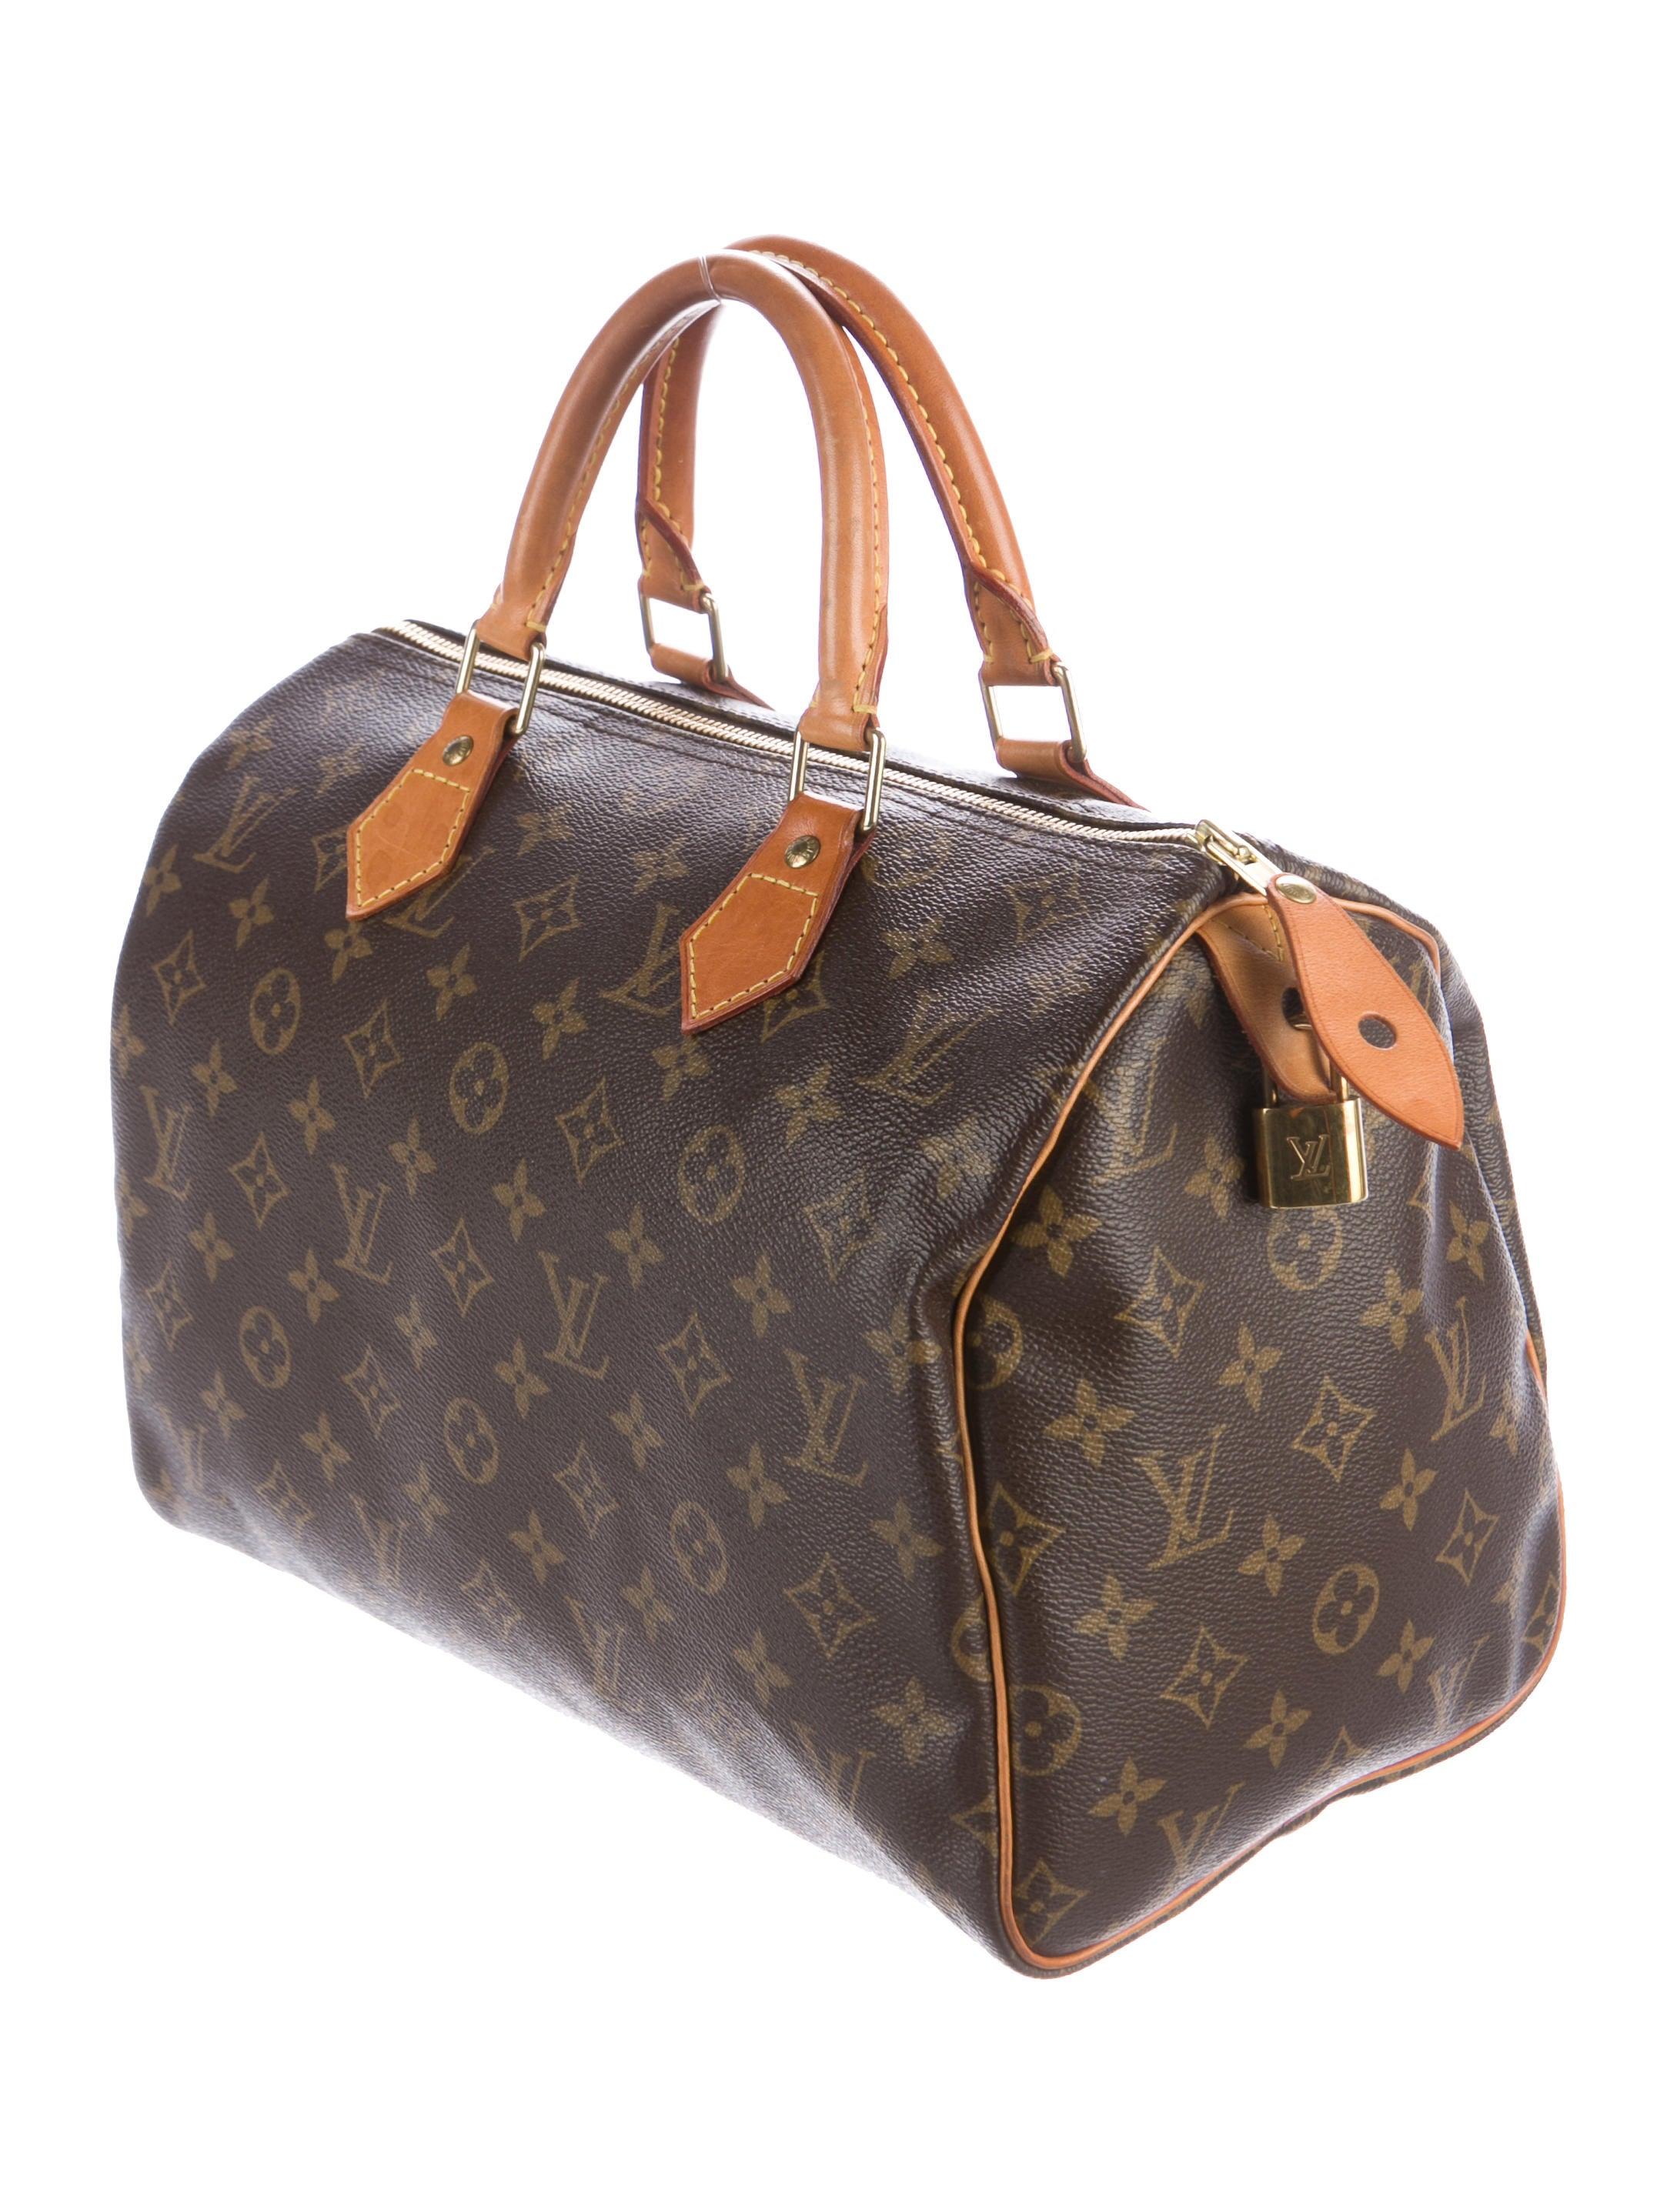 Louis vuitton monogram speedy 35 handbags lou127876 for Louis vuitton miroir speedy 35